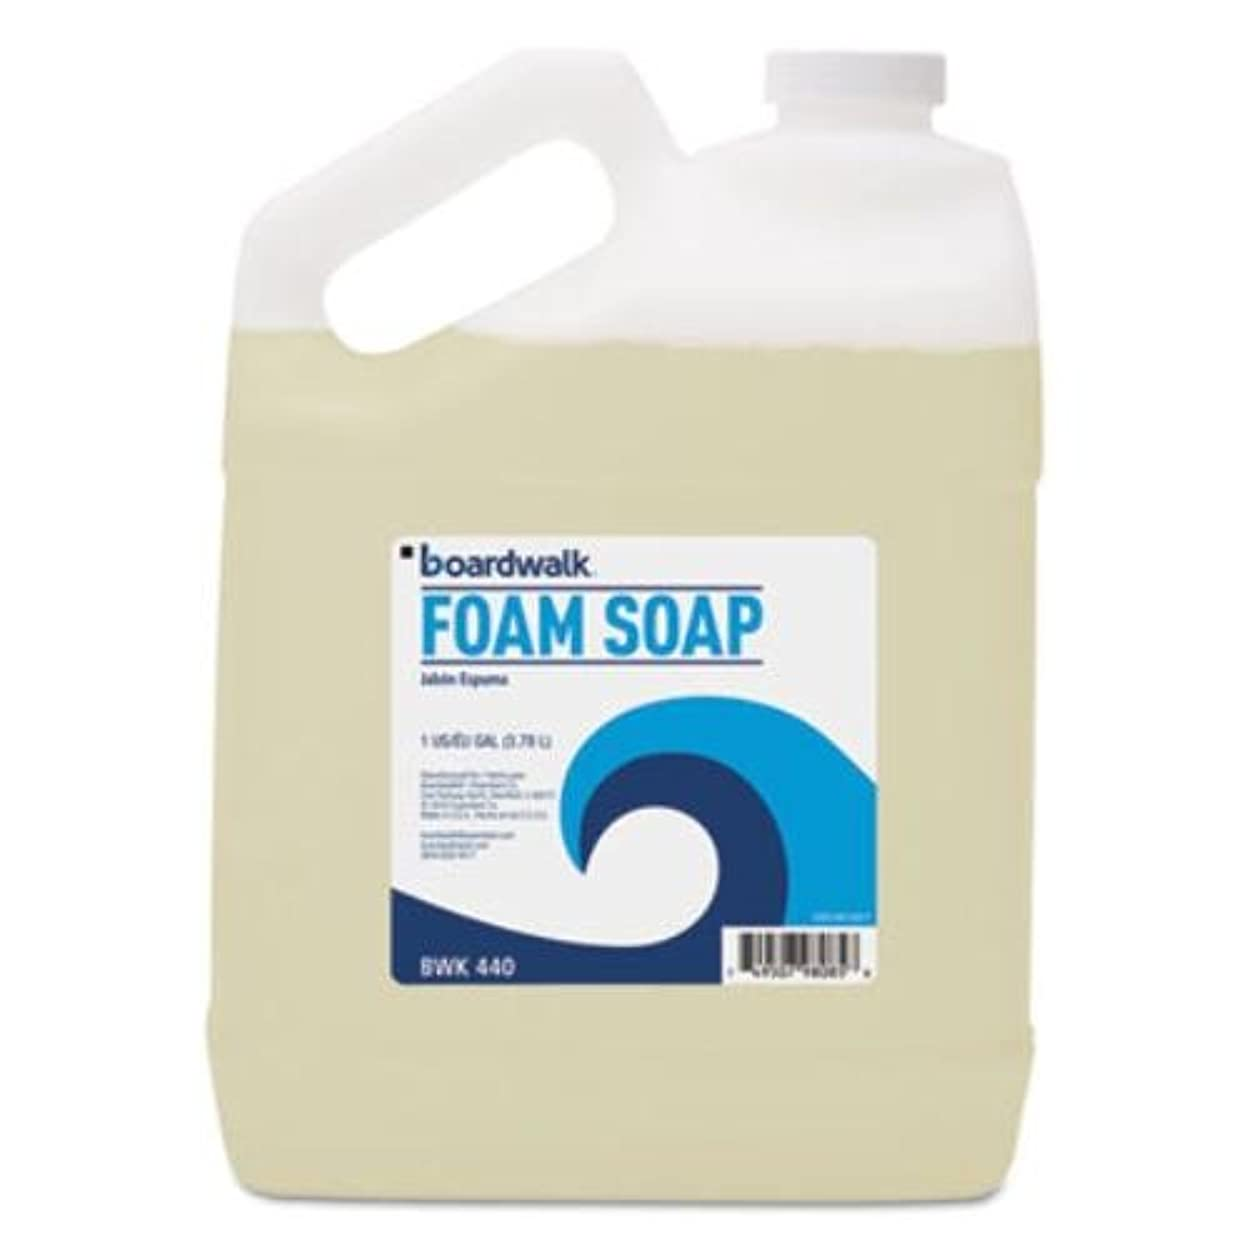 空洞劇場対称bwk440 – Boardwalk Foaming Hand Soap